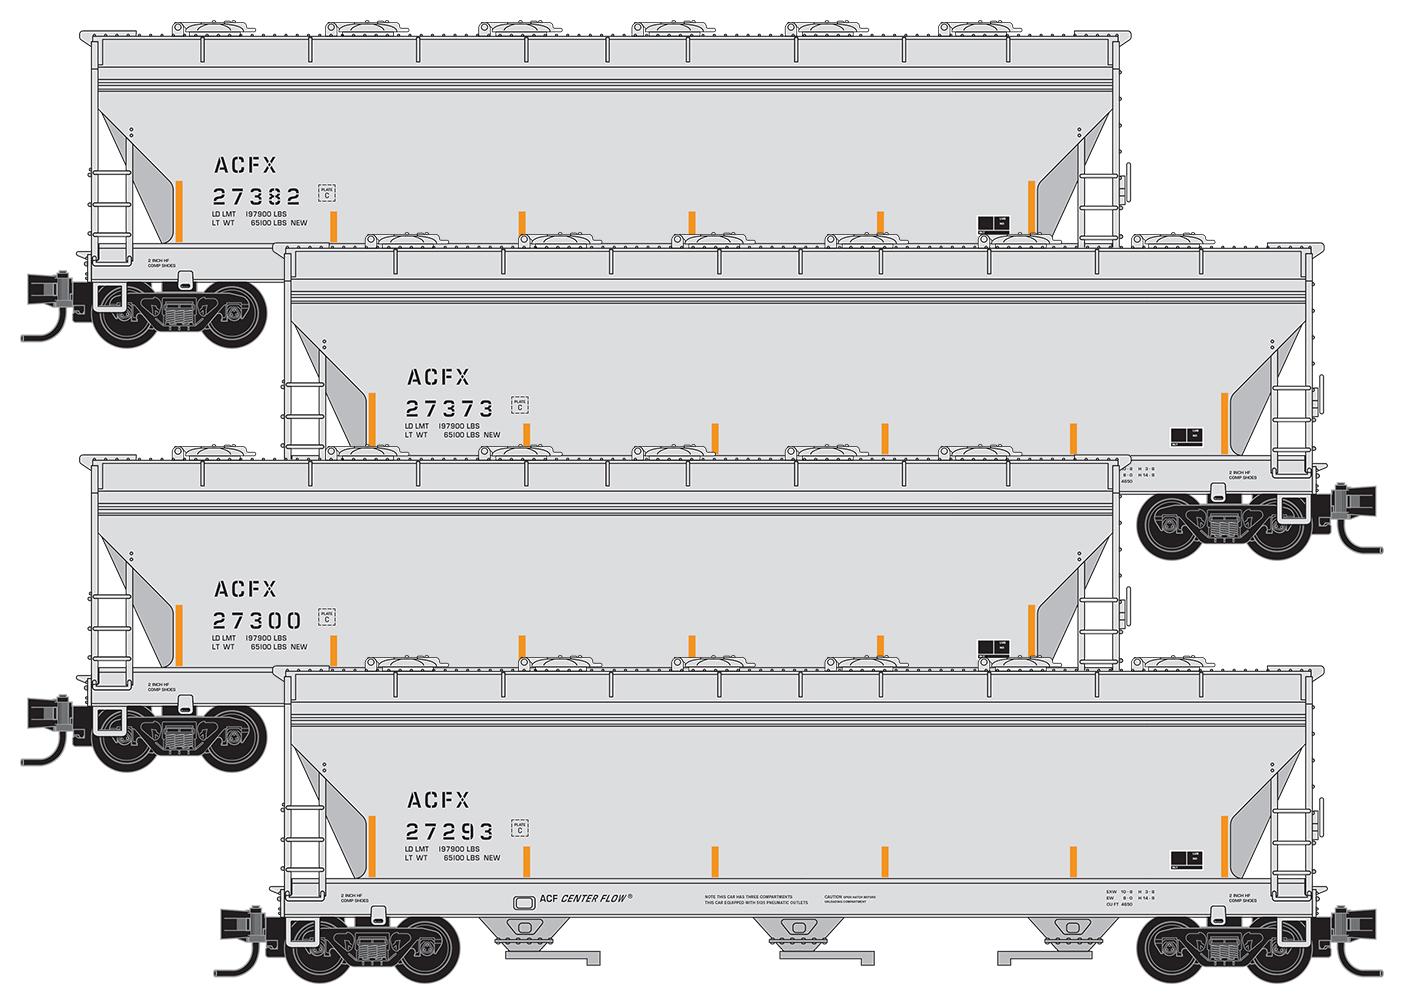 N Scale - Micro-Trains - 993 00 166 - Covered Hopper, 3-Bay, ACF 4650 - American Car & Foundry - 4-Pack